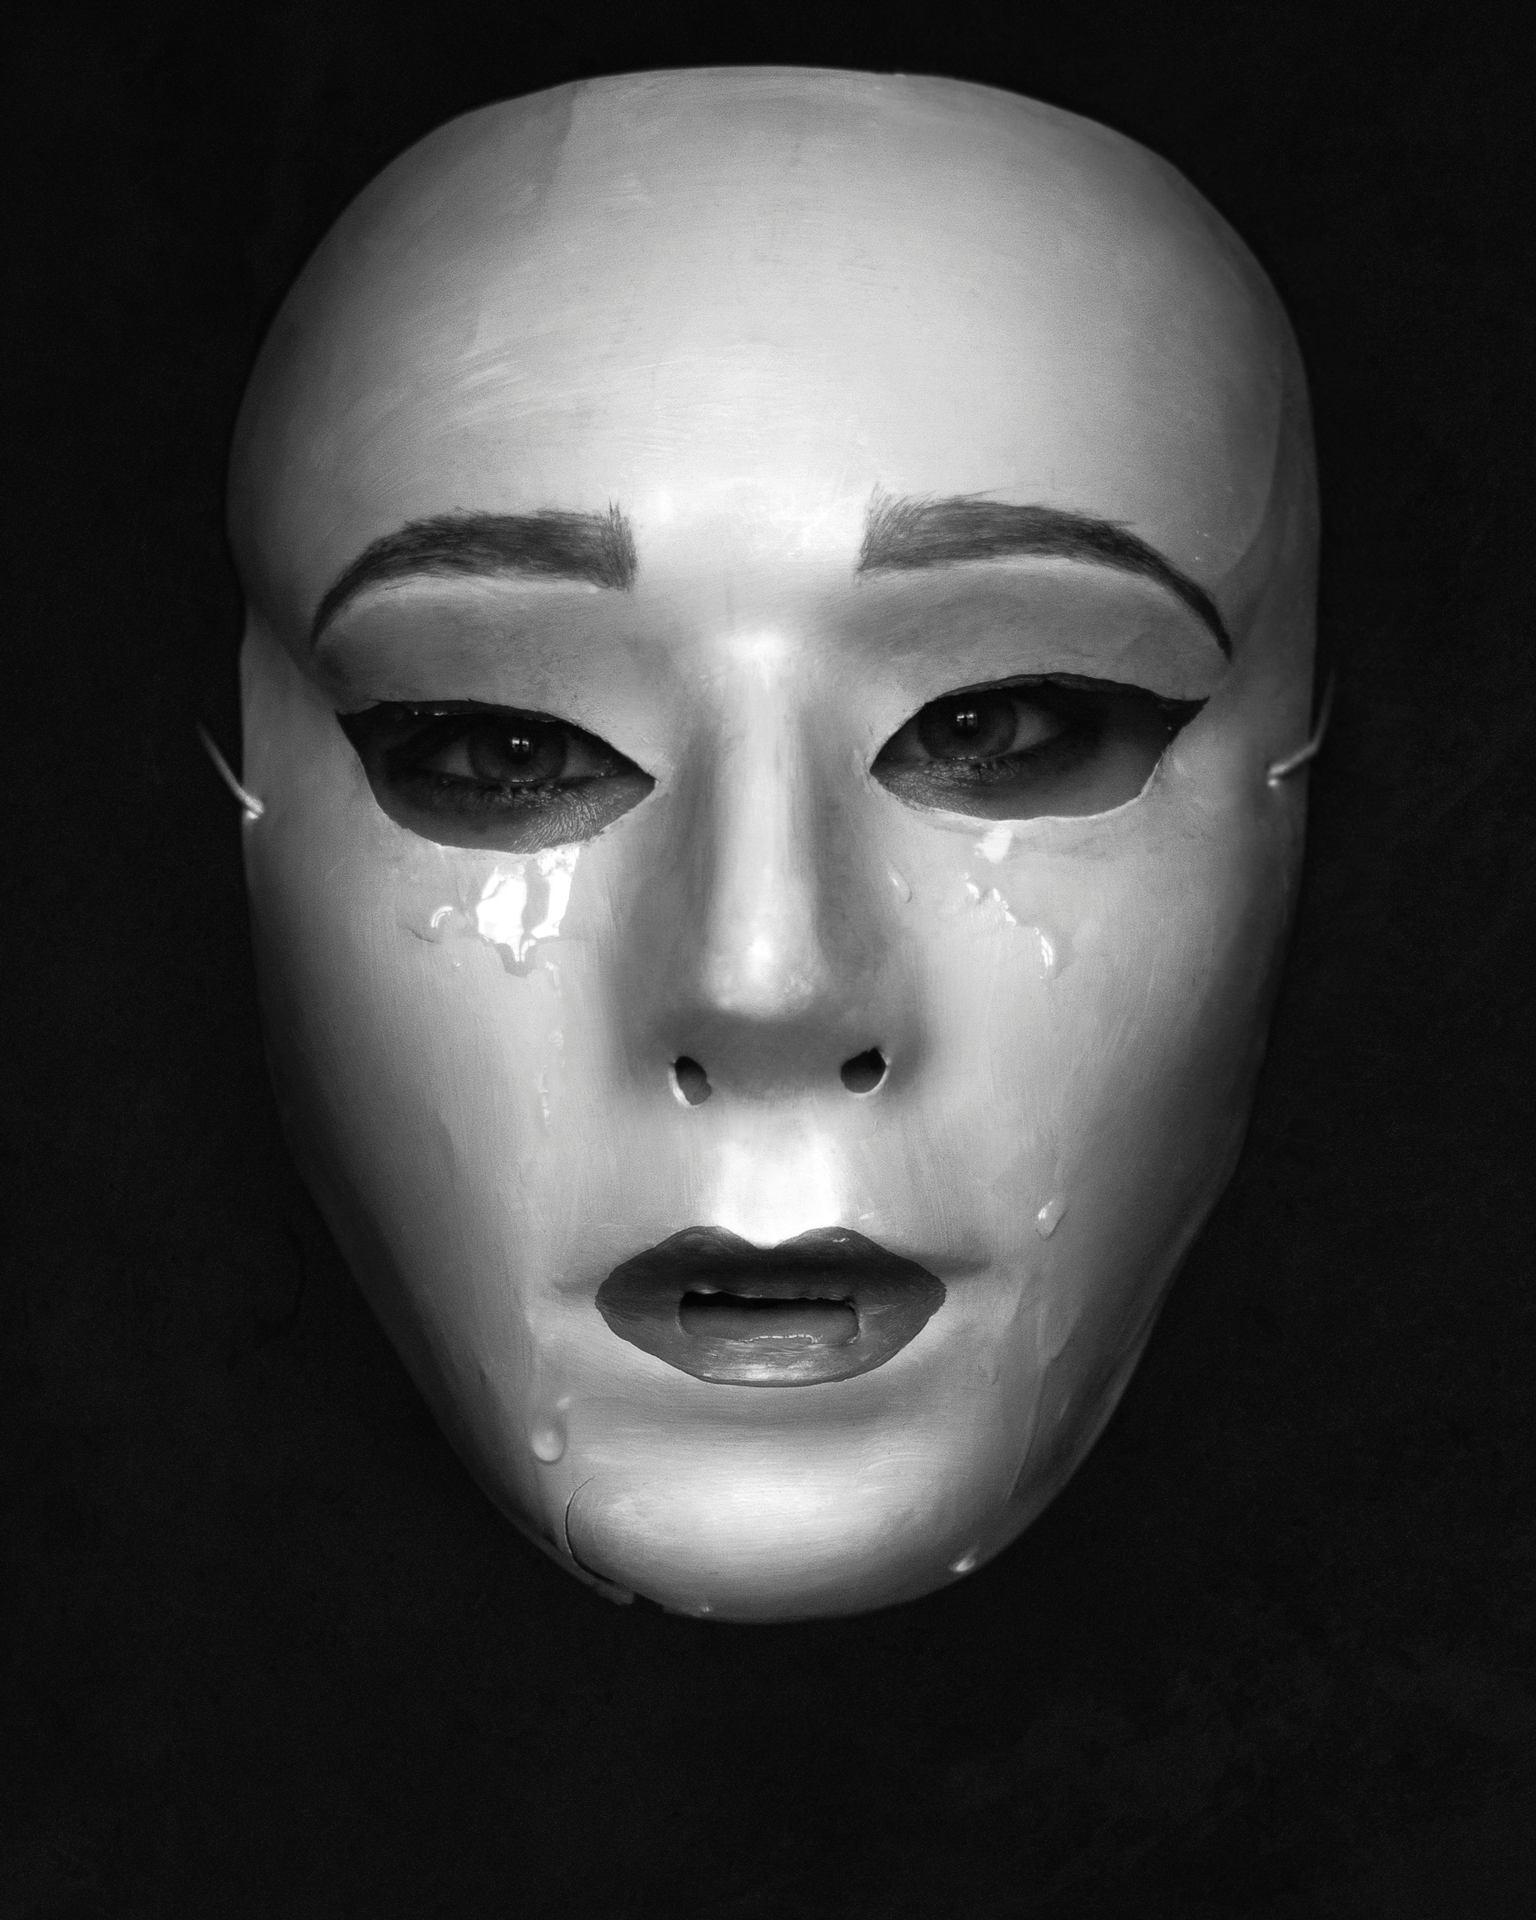 Au-delà du masque